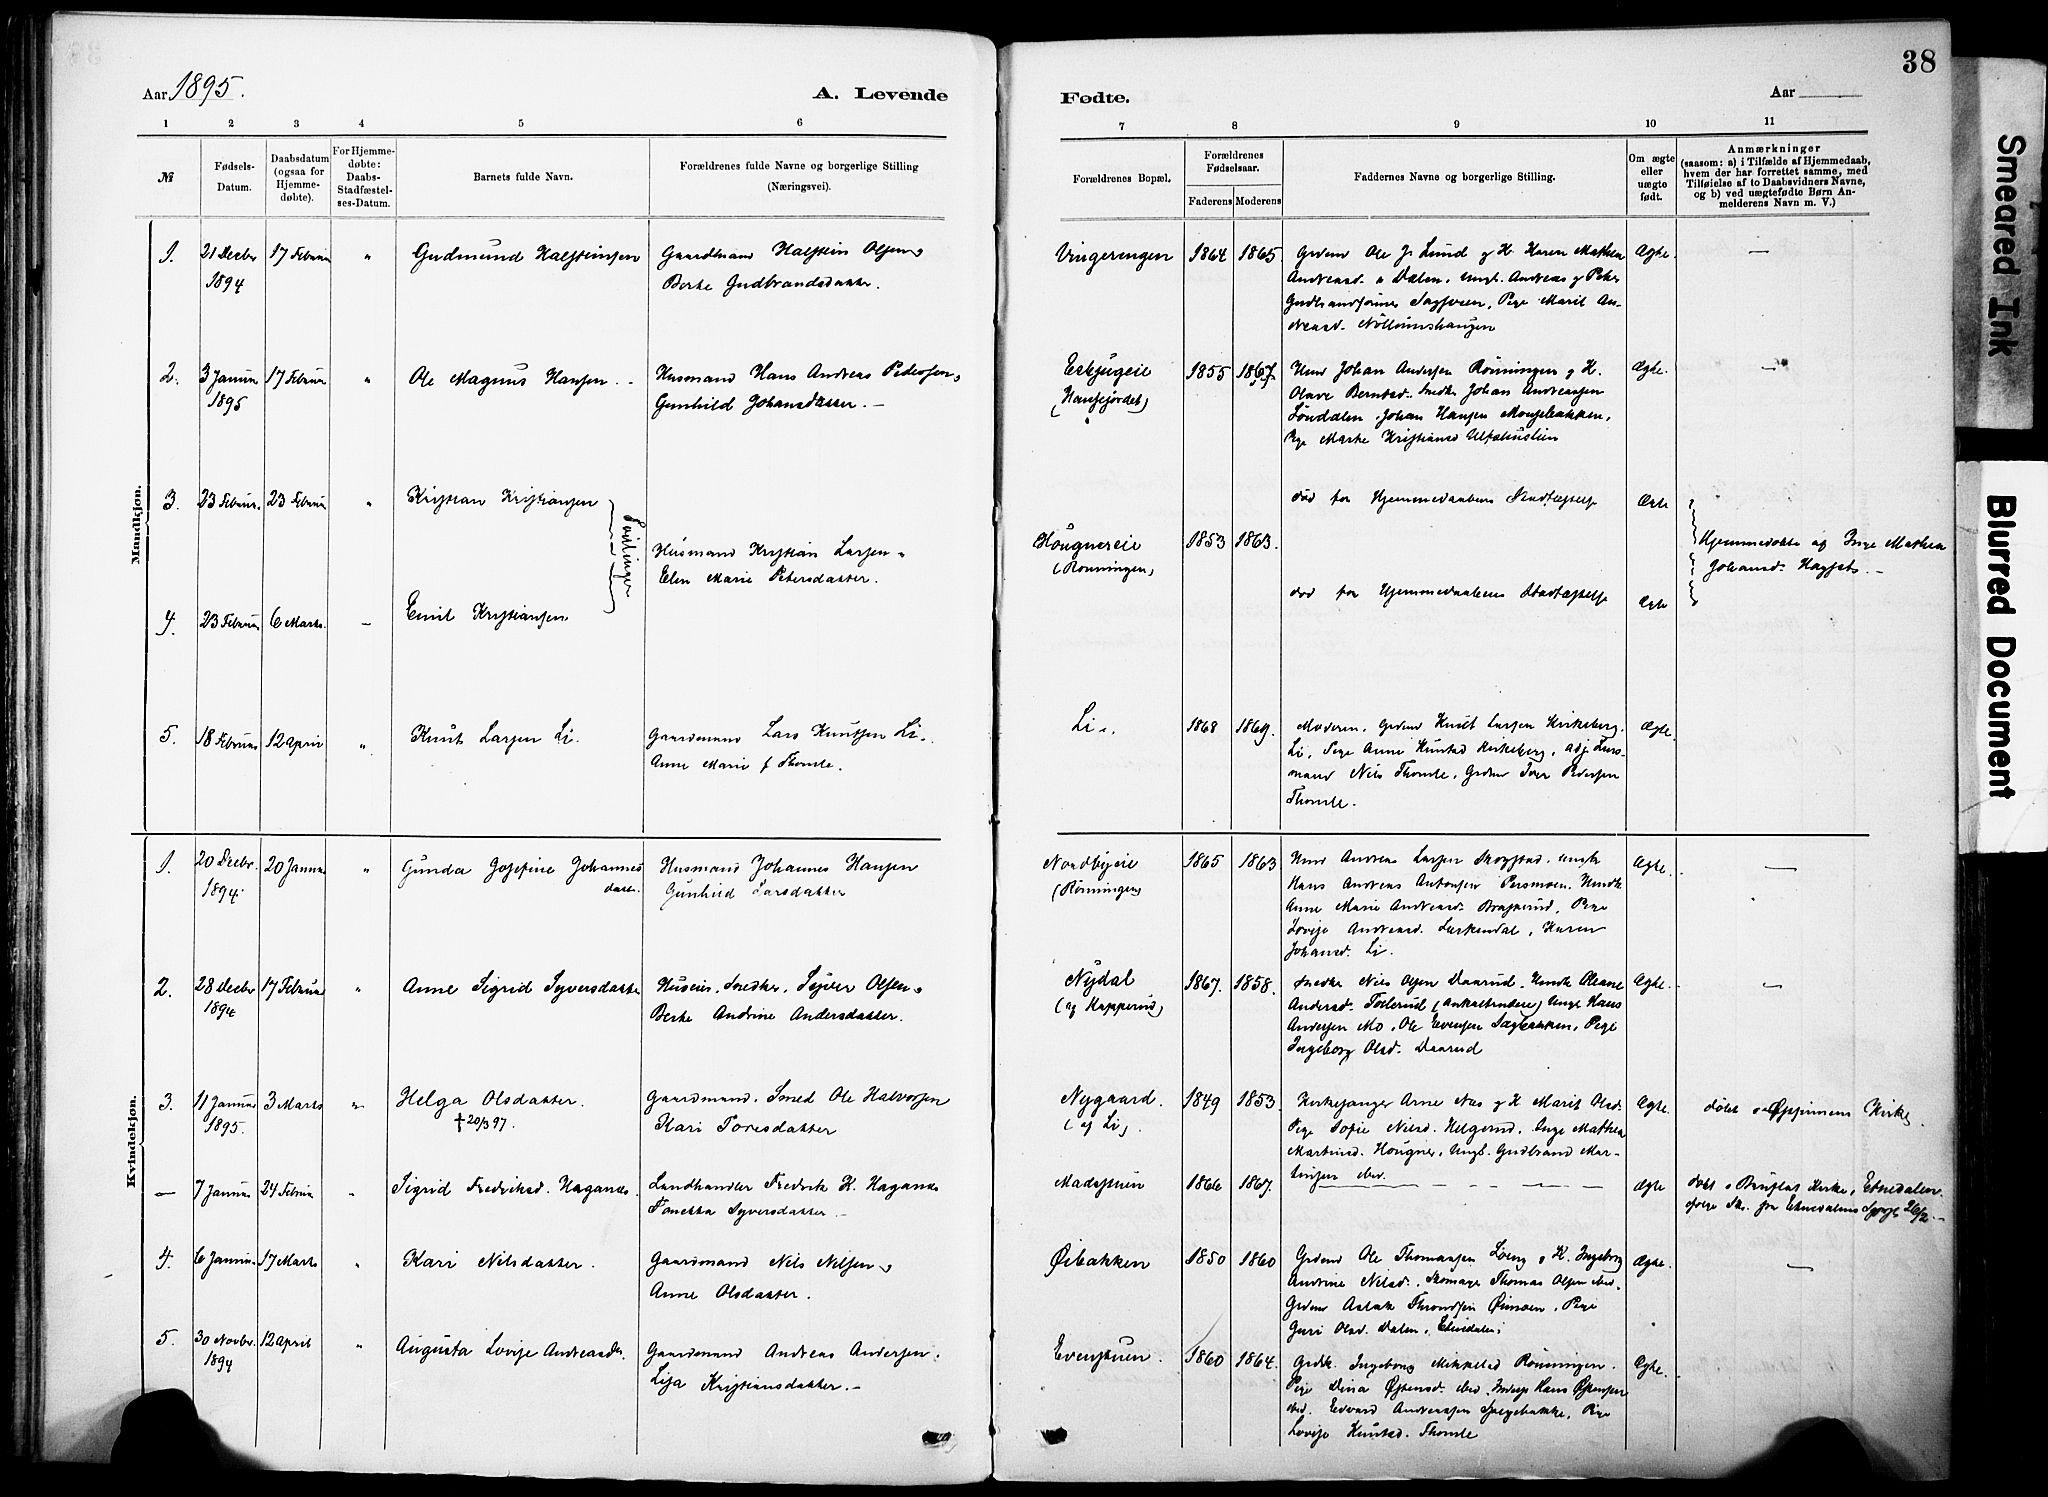 SAH, Nordre Land prestekontor, Ministerialbok nr. 5, 1882-1903, s. 38